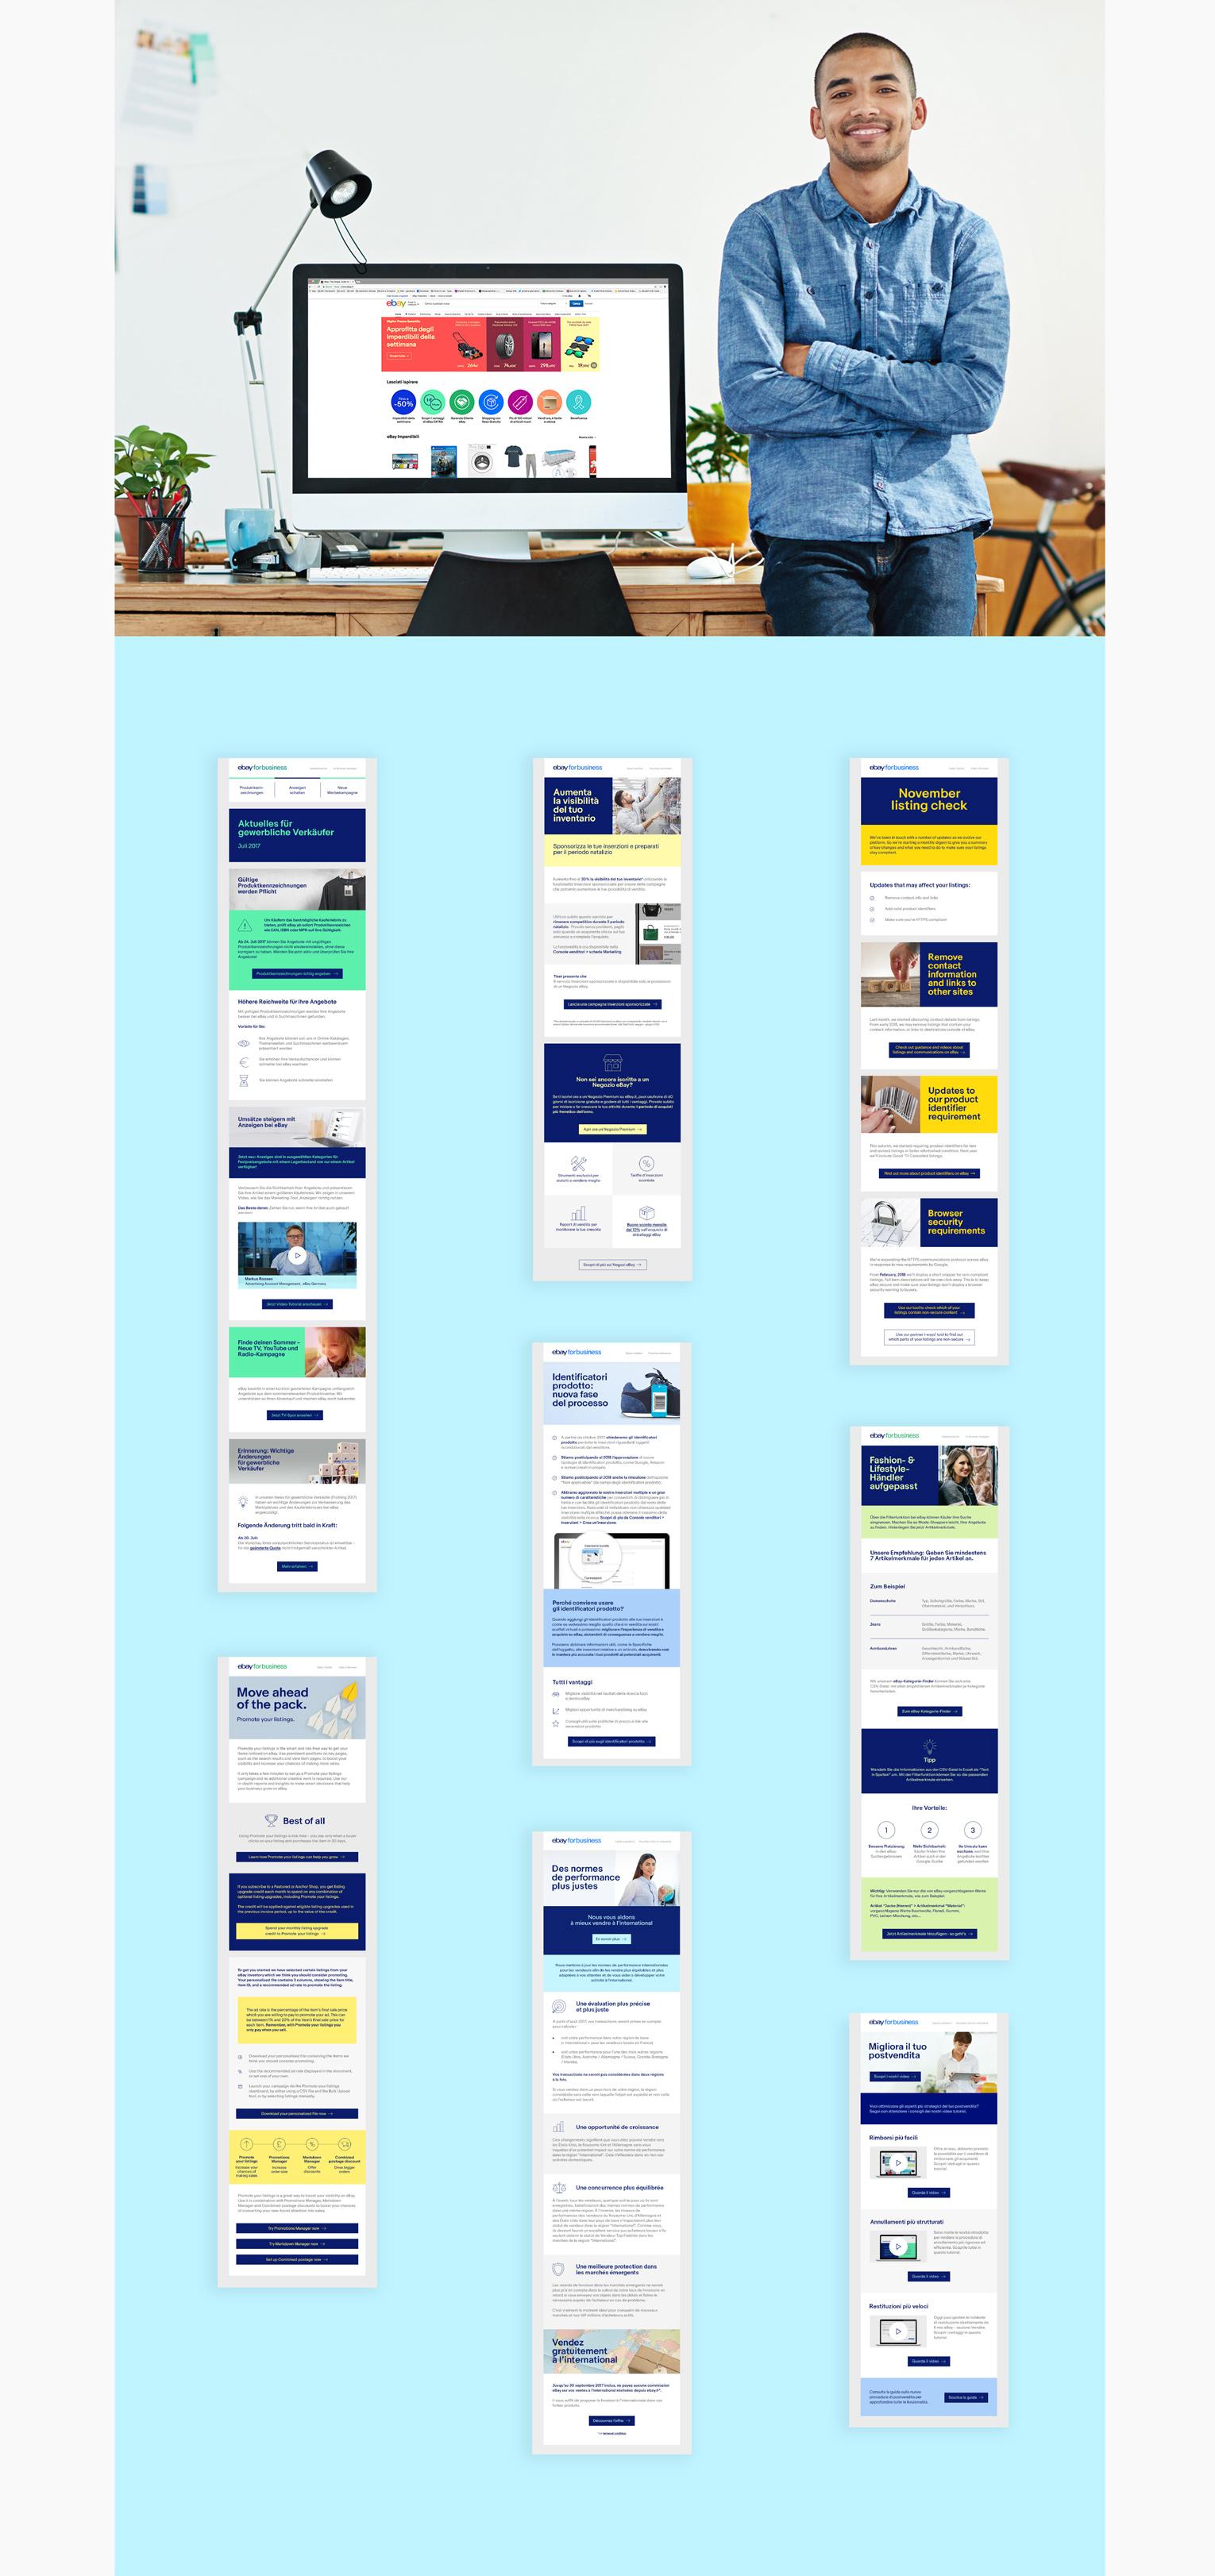 ebayforbusiness_campaign2p